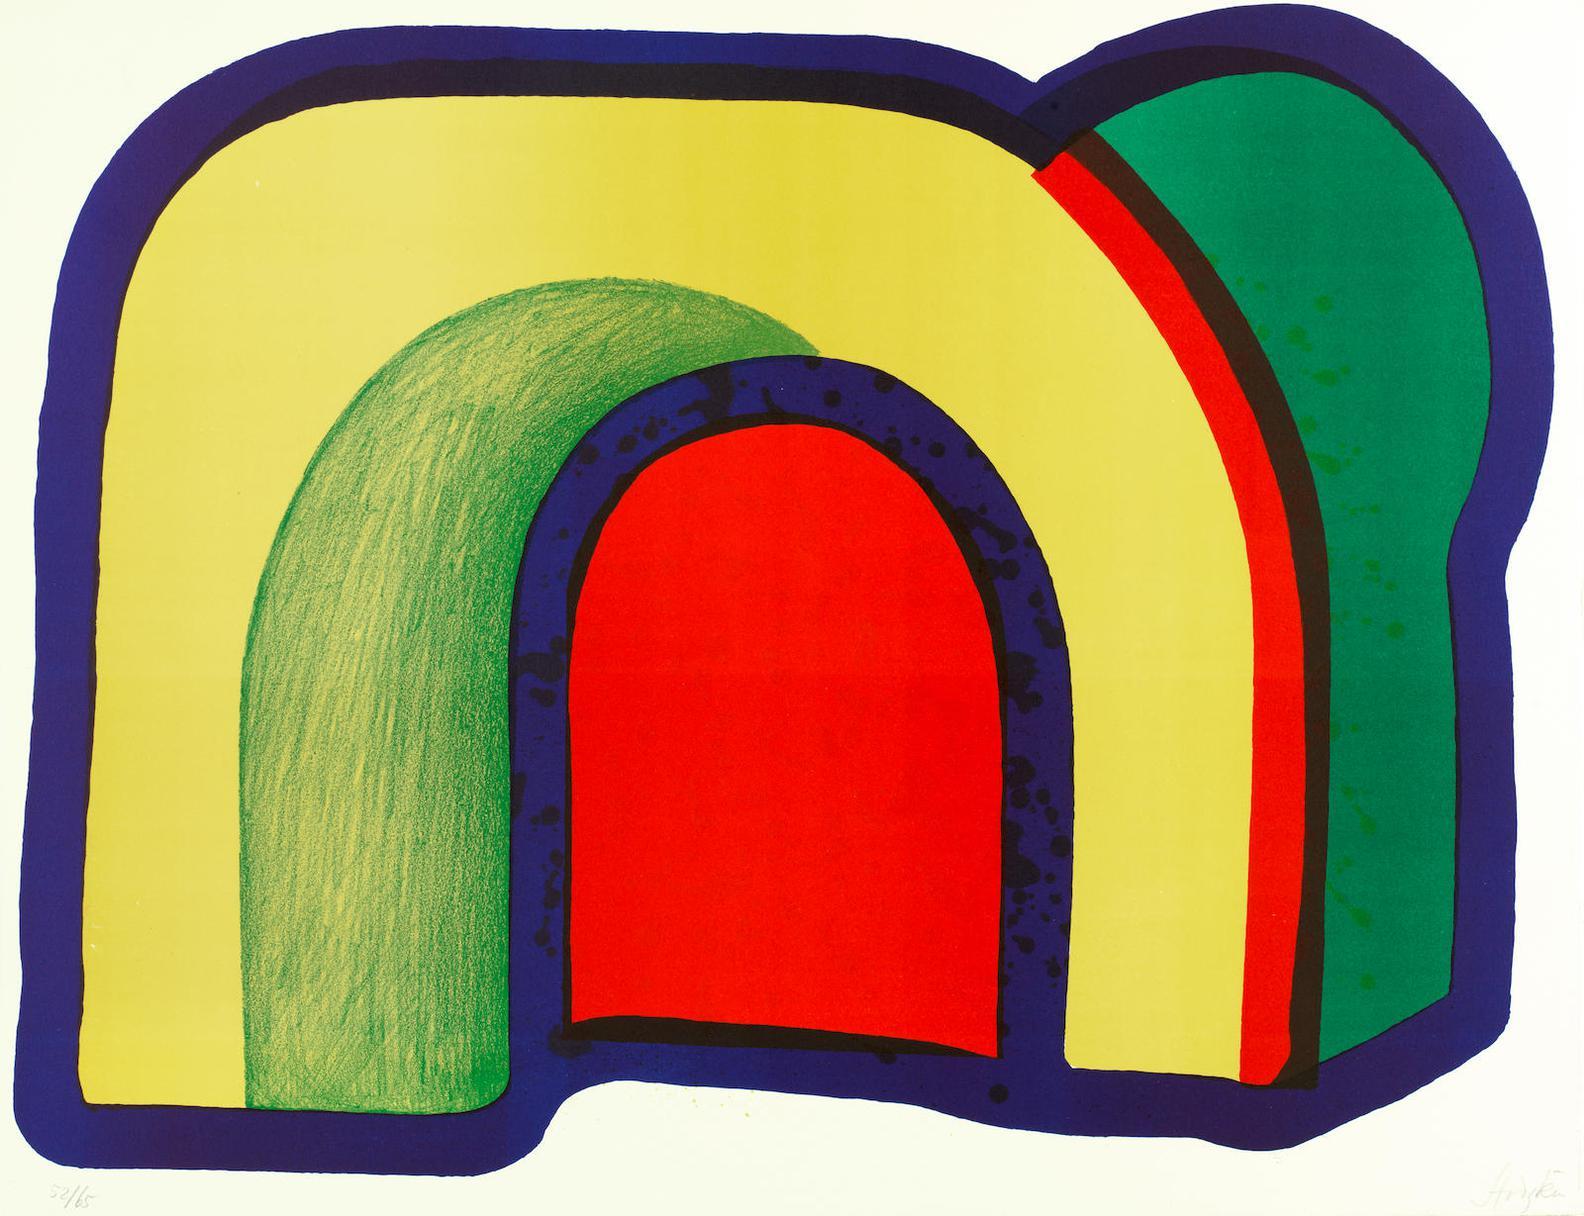 Howard Hodgkin-Composition With Red (Also Called Arch), From 'Europaische Graphik Vii. Englische Kunstler'-1970